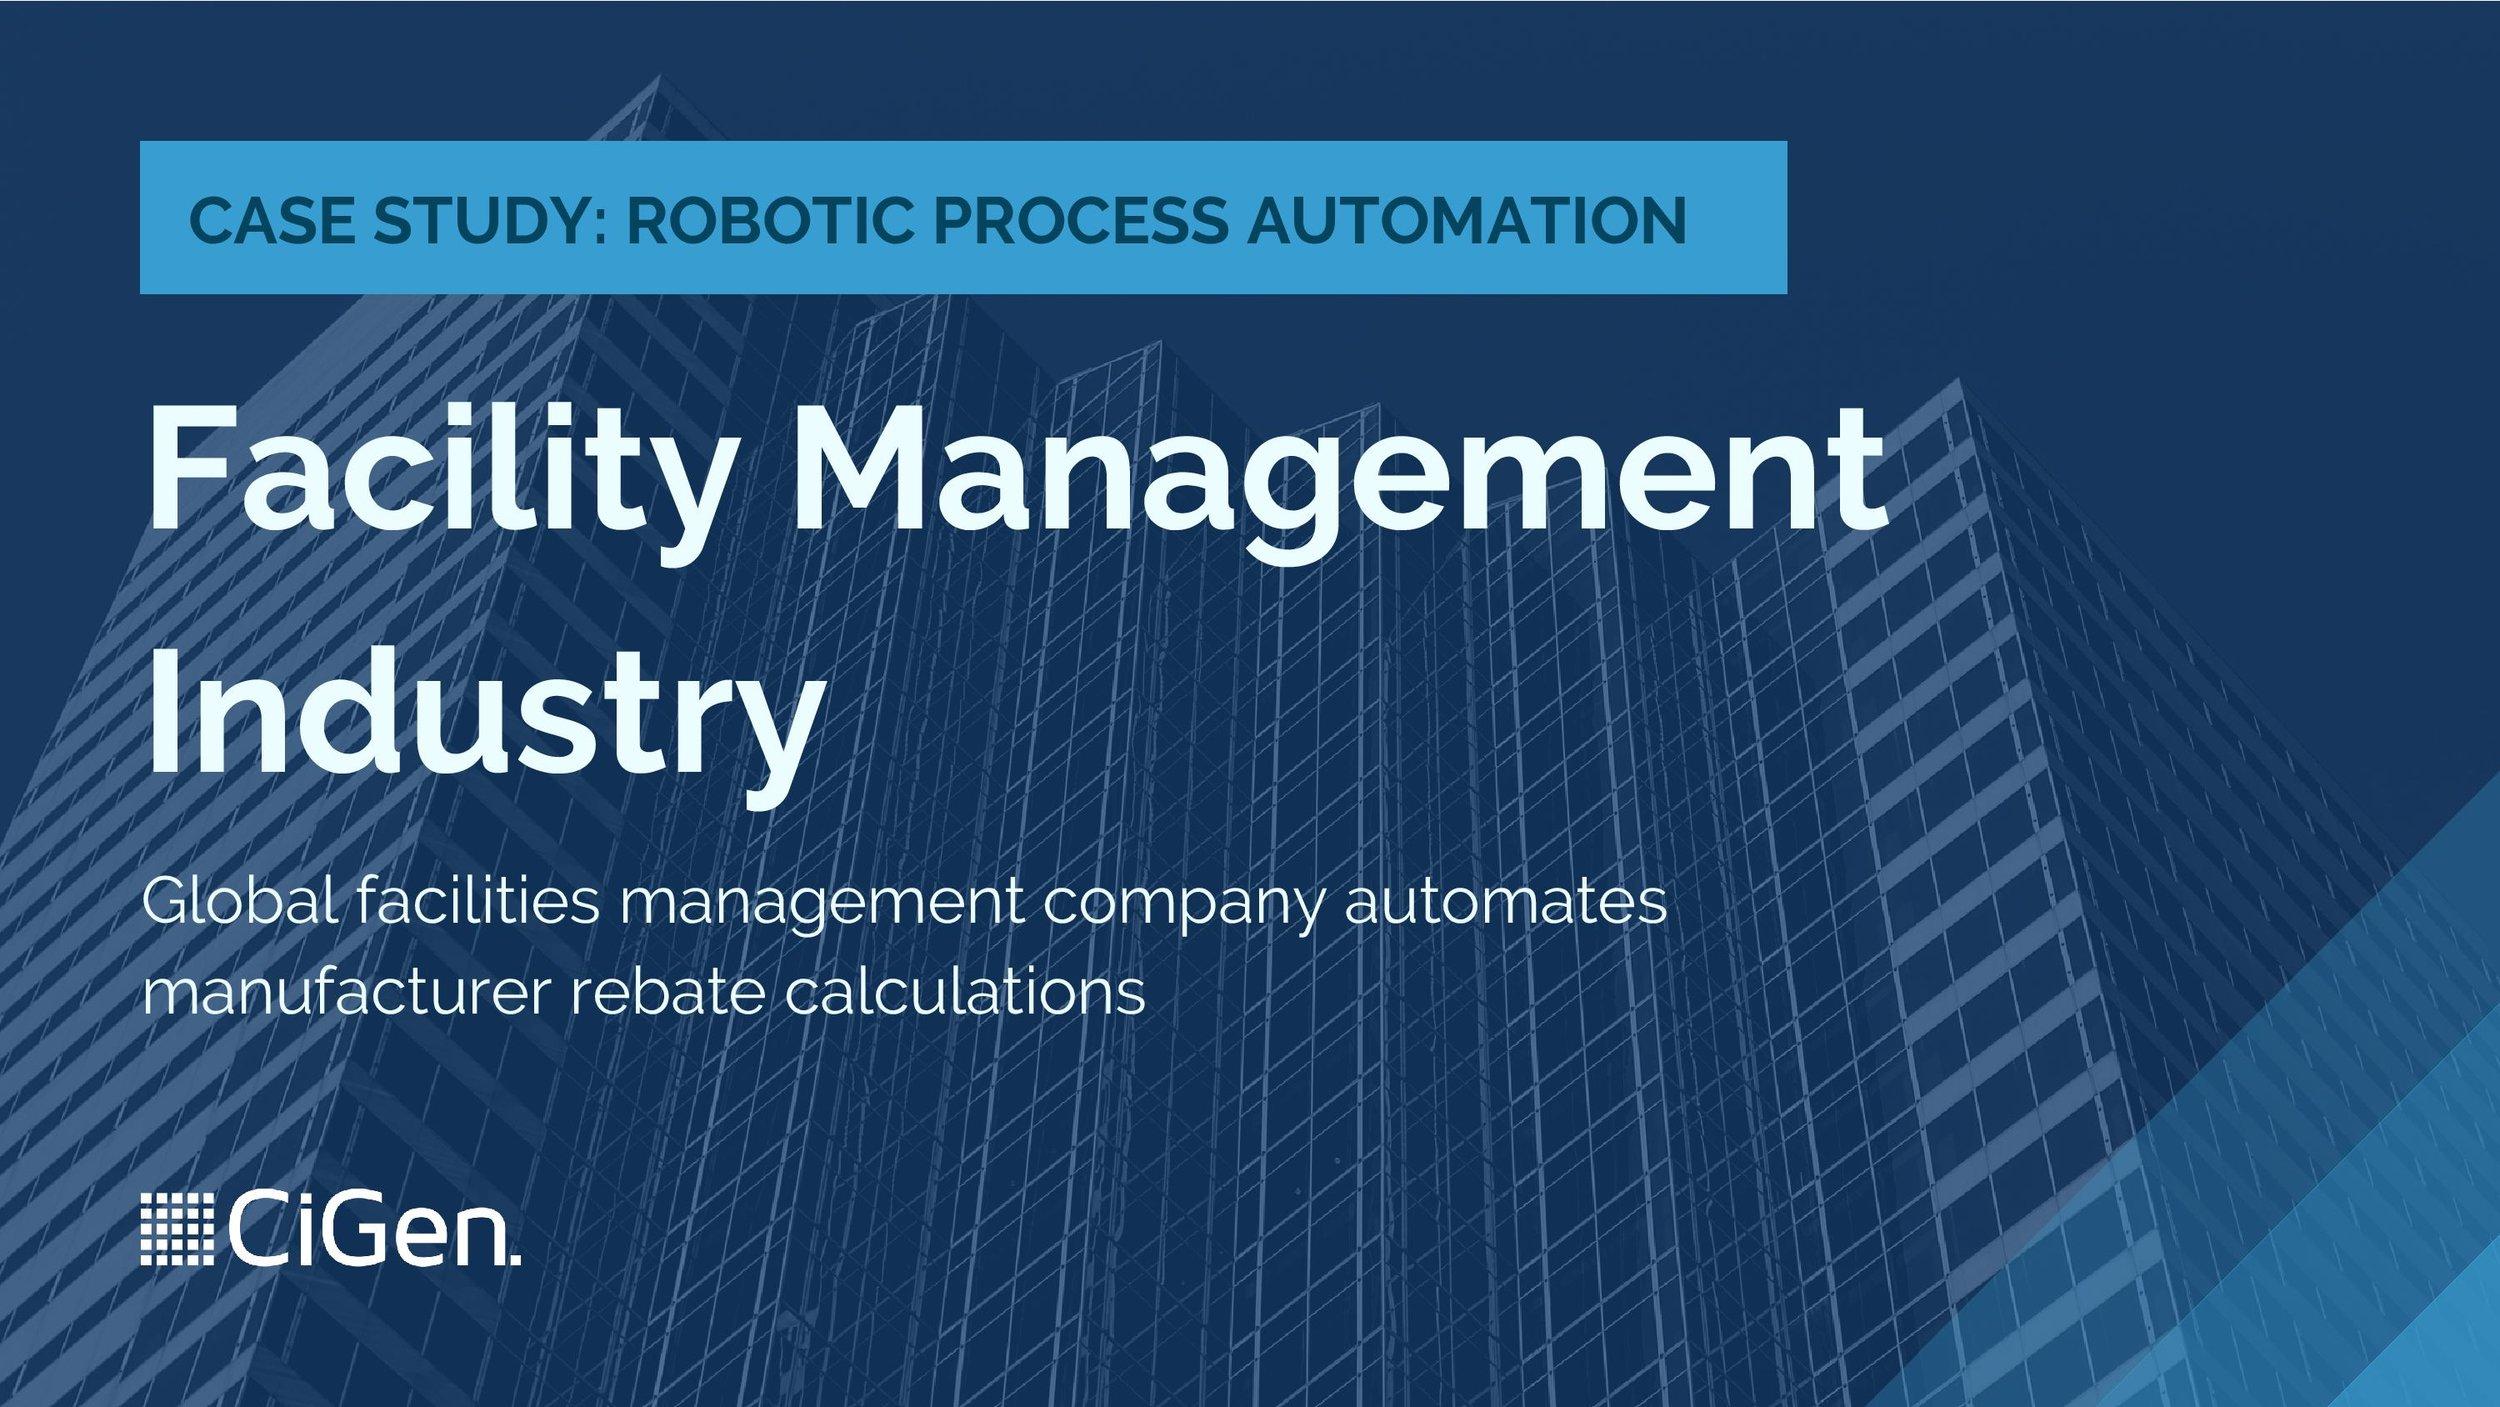 CiGen-robotic-process-automation-RPA-Australia-case-study-global-facilities-management-company-automates-manufacturer-rebate-calculations-page-001.jpg